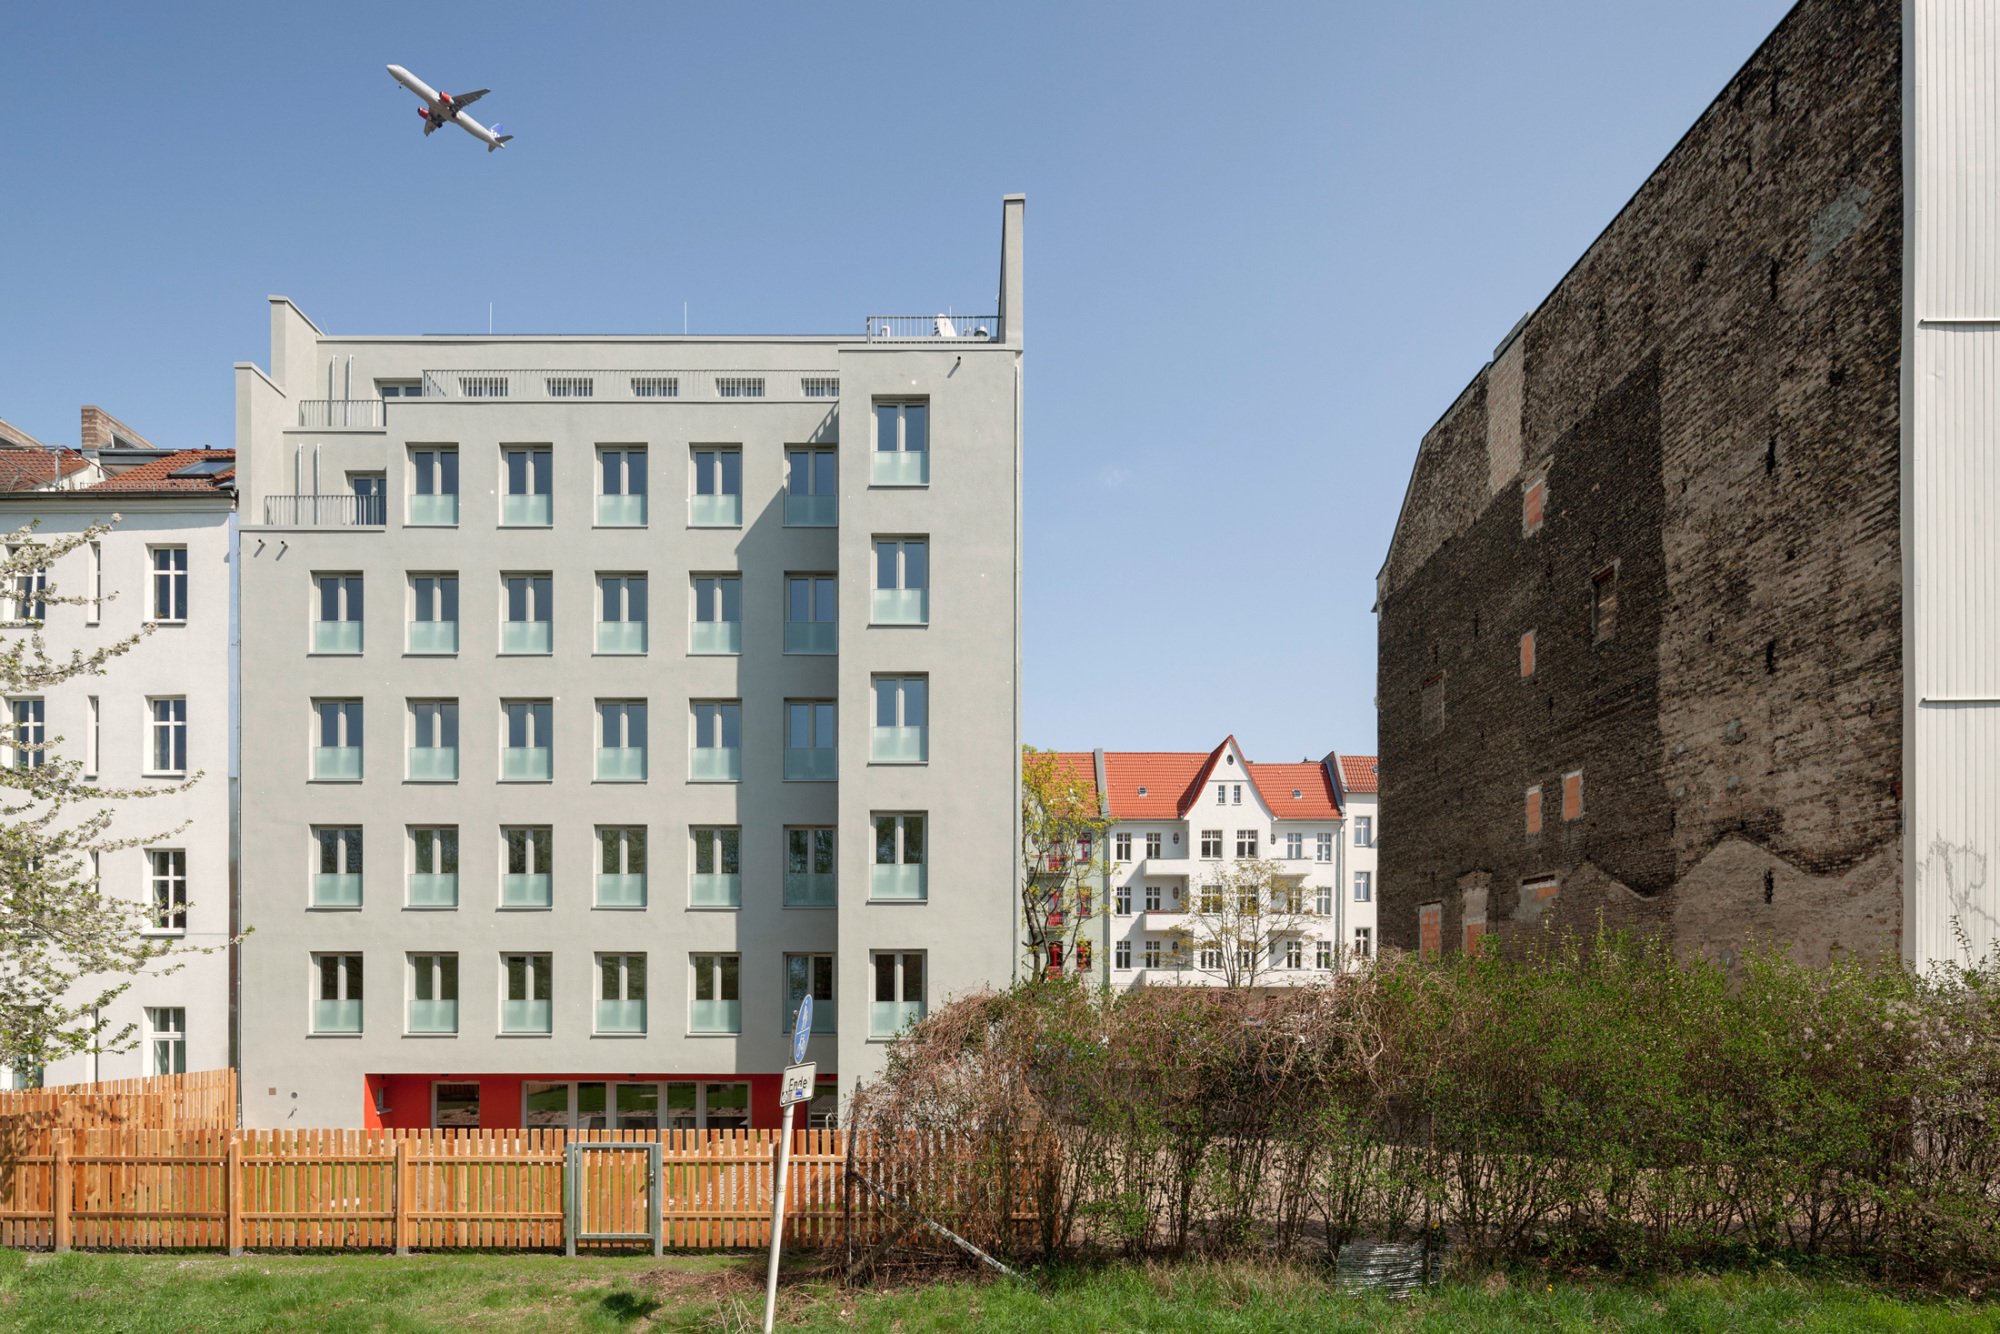 Ulrich Schwarz, Berlin